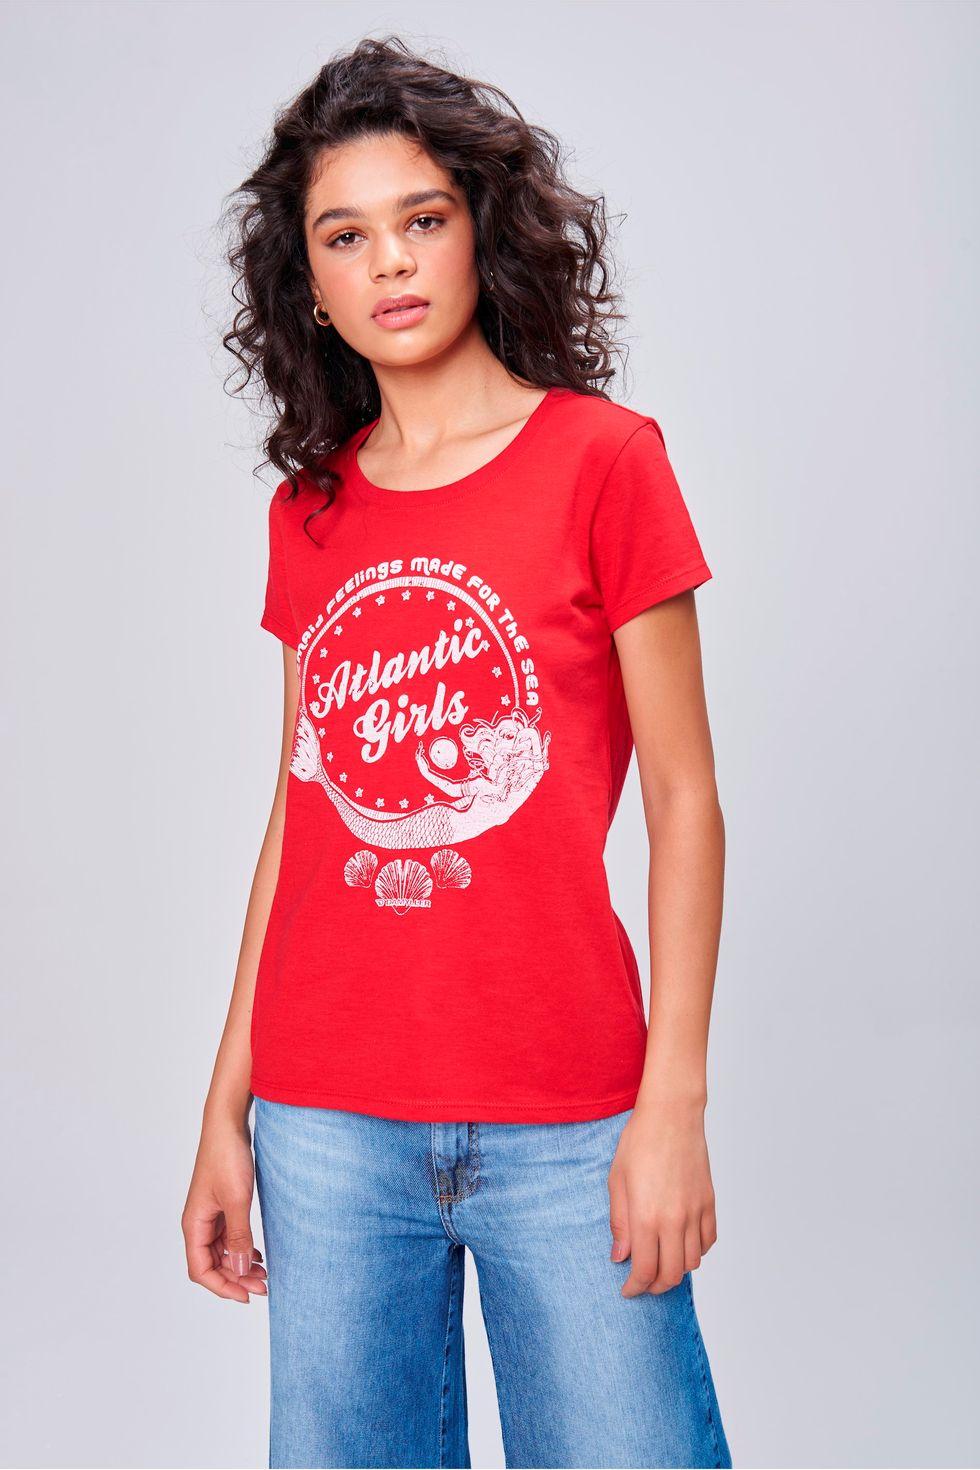 Camiseta-Feminina-Mermaid-Feelings-Frente--